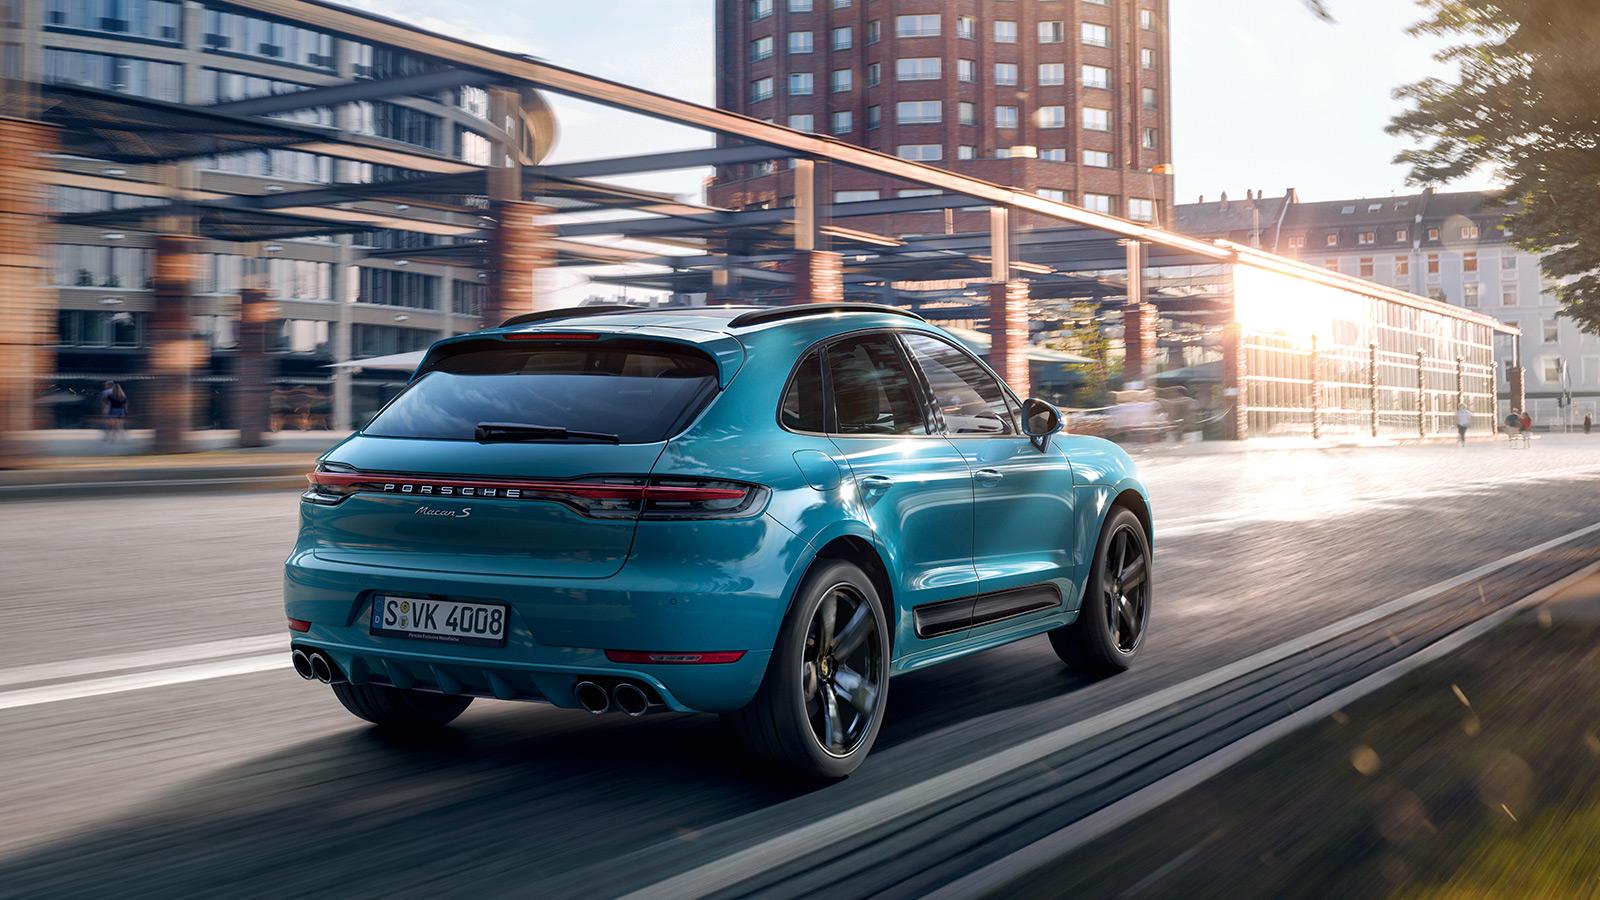 Porsche - 외관 및 성능